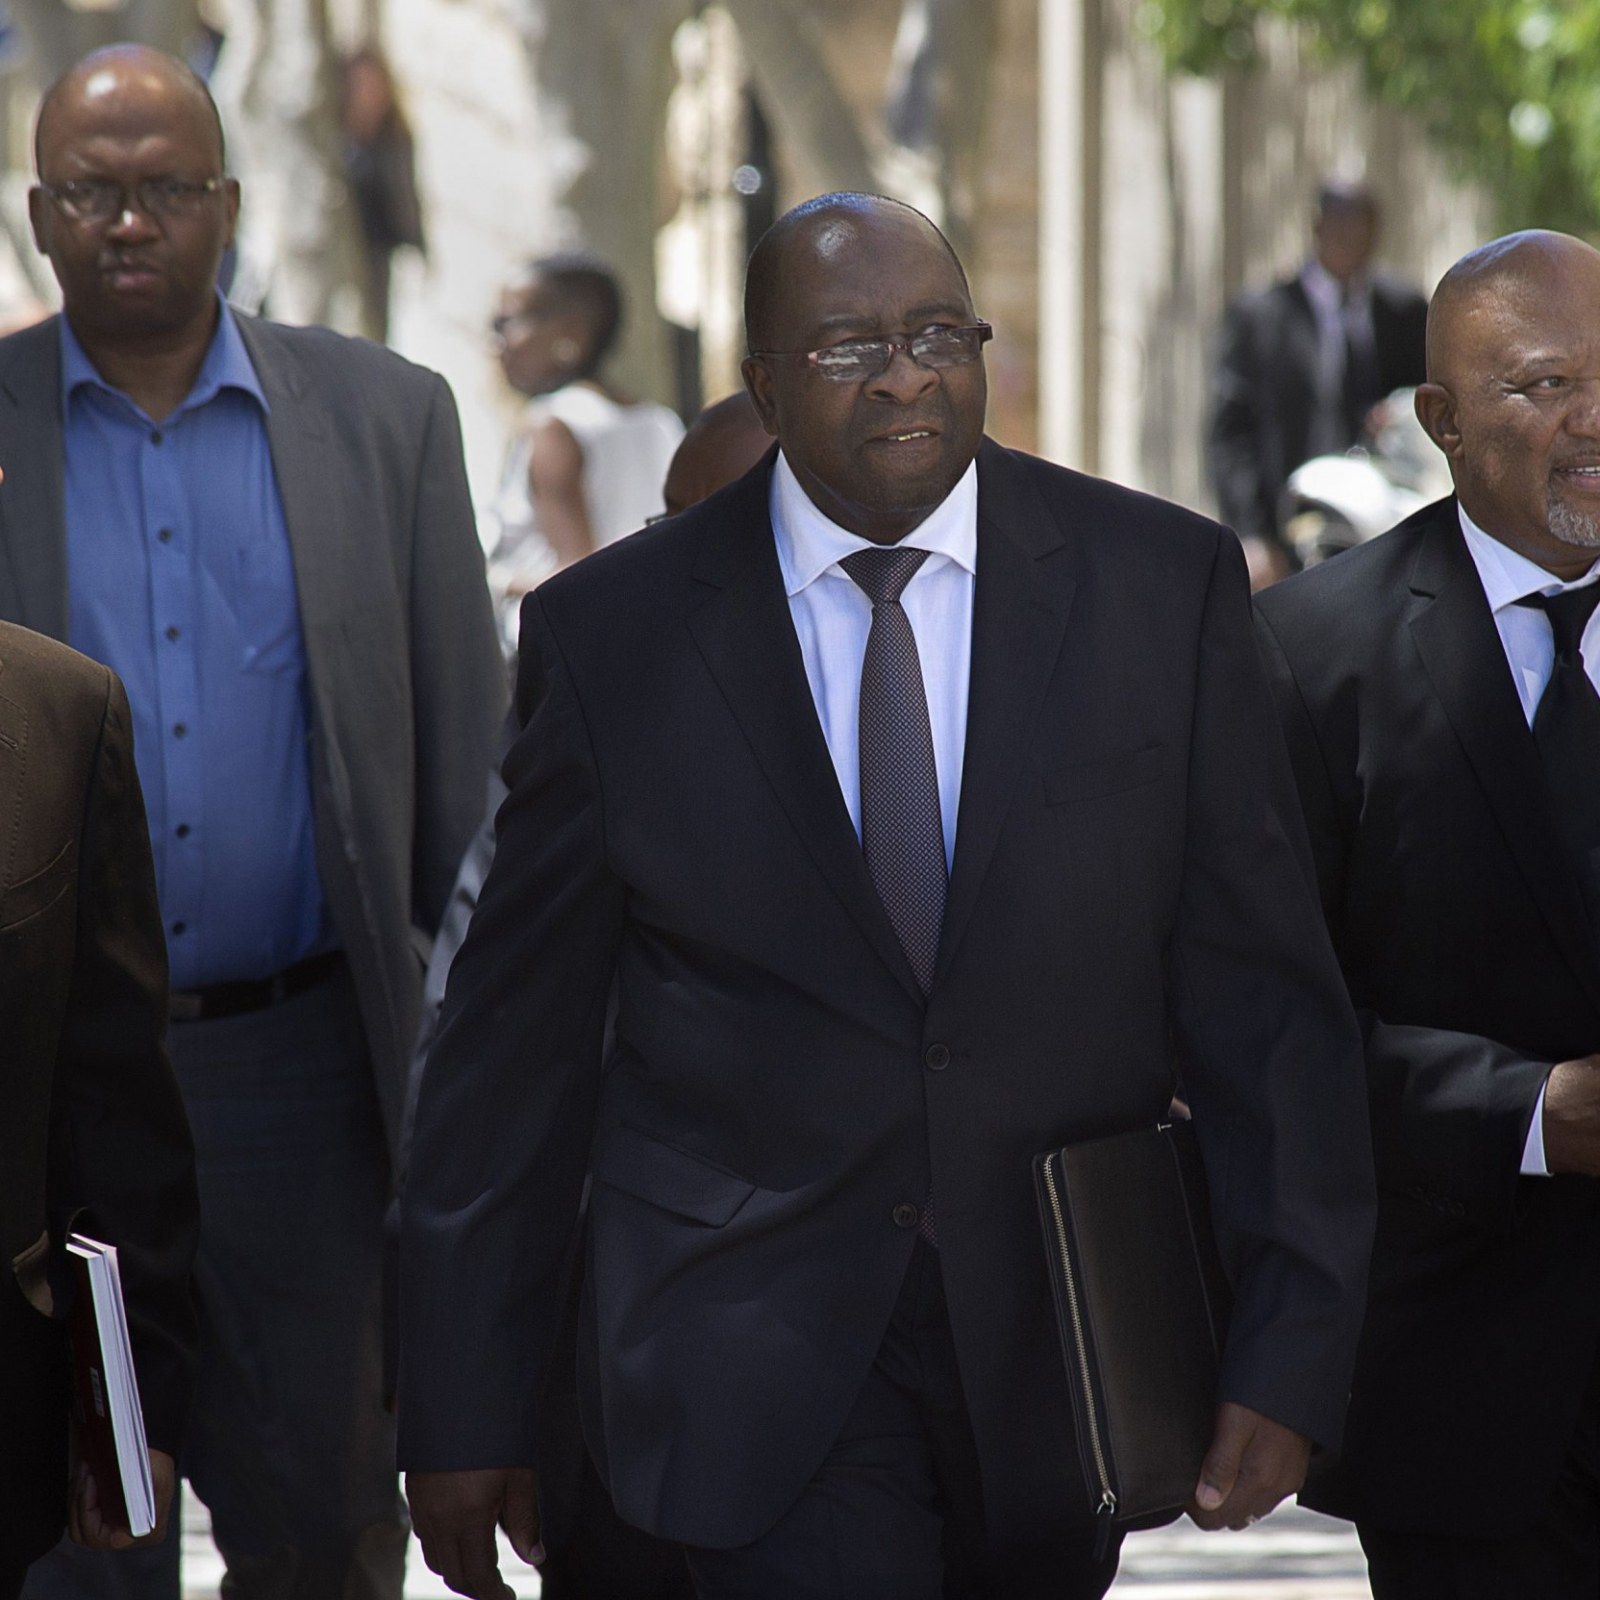 South Africa Zuma S Friends Offered Finance Ministry Job